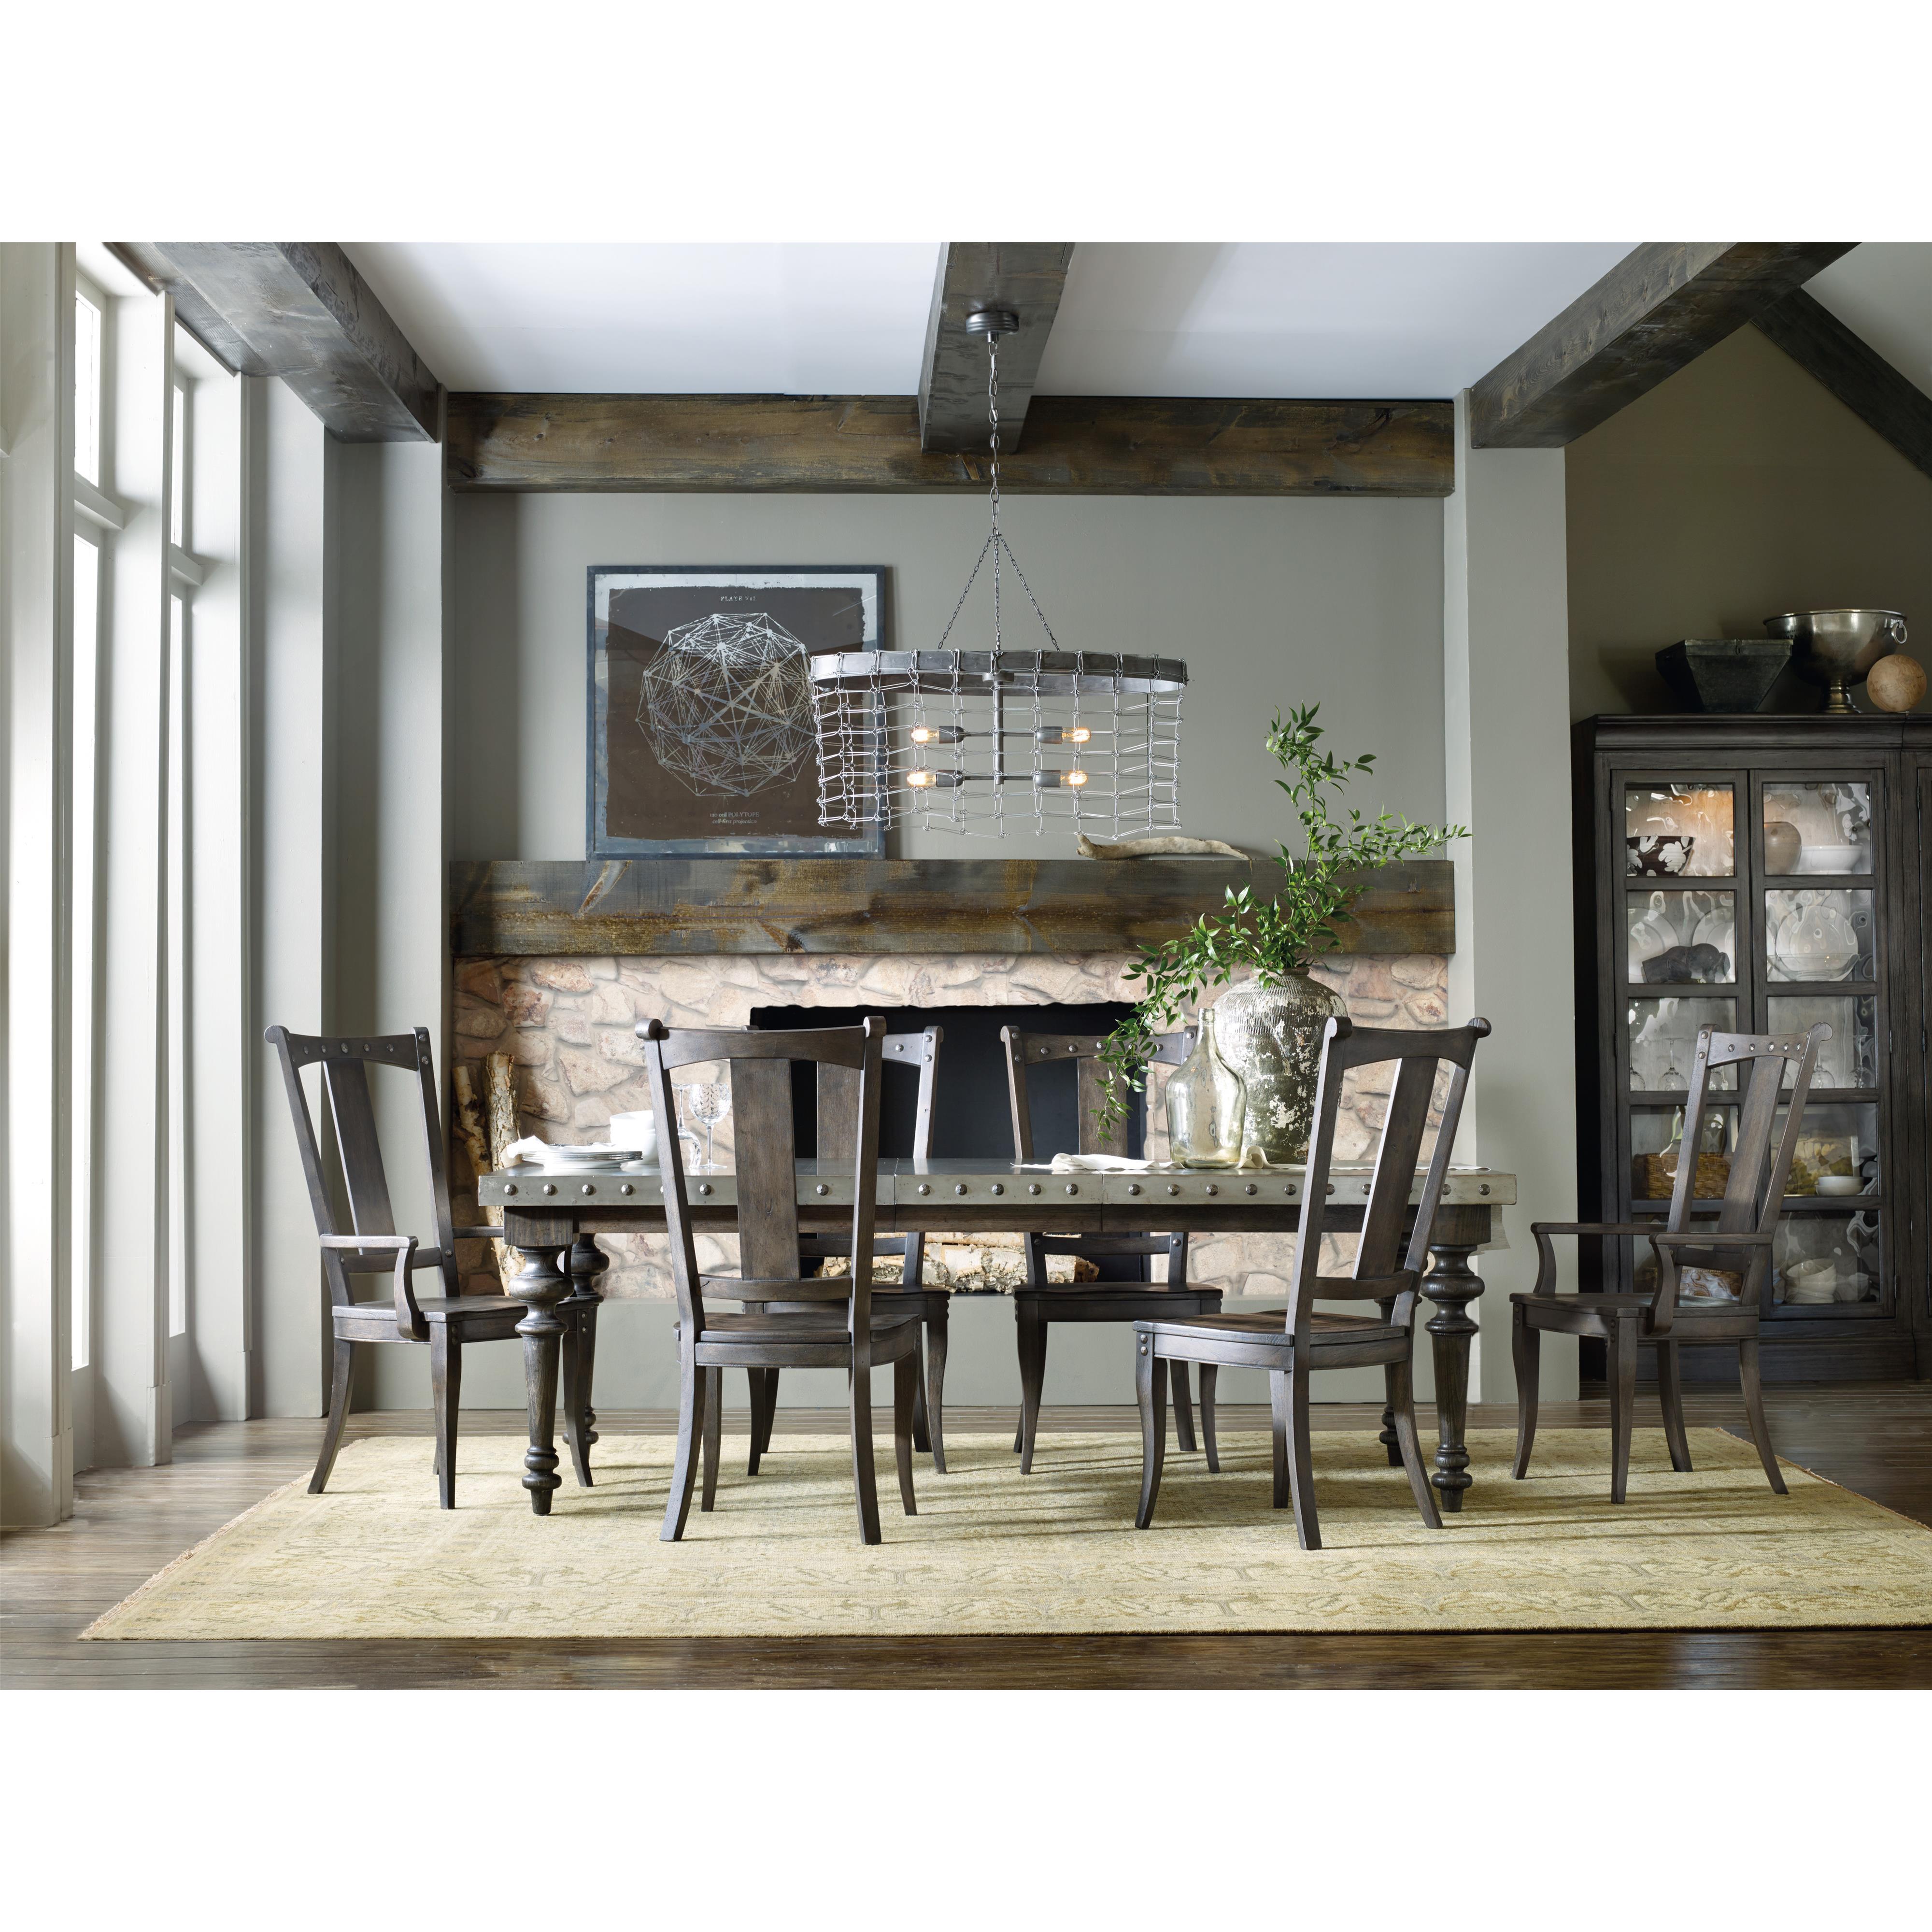 Hooker dining room table